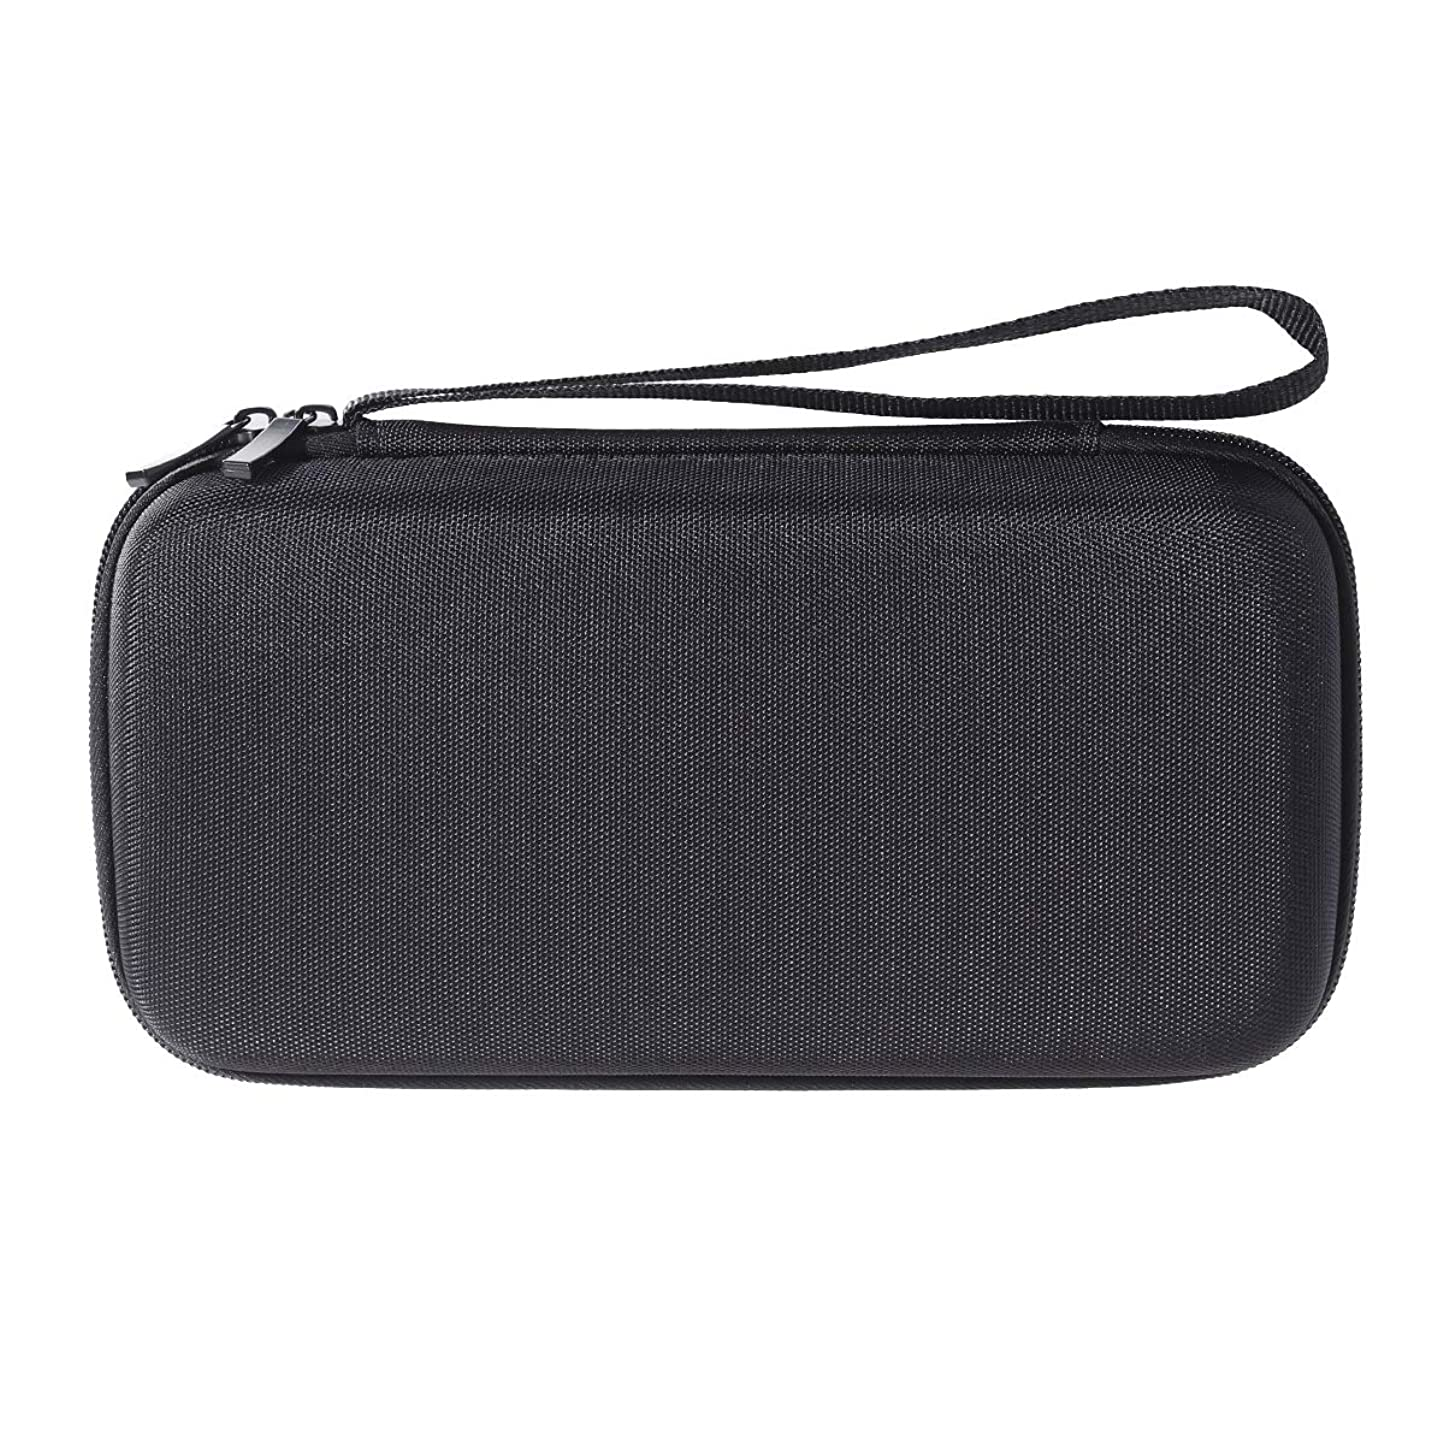 第三レシピ名門WINOMO 電卓ケース 電卓 収納ケース EVA 保護ケース 携帯ポーチ 黒 TI-83 Plus/TI-84 Plus CE/TI-84 Plus/TI-89 Titanium / HP50G対応